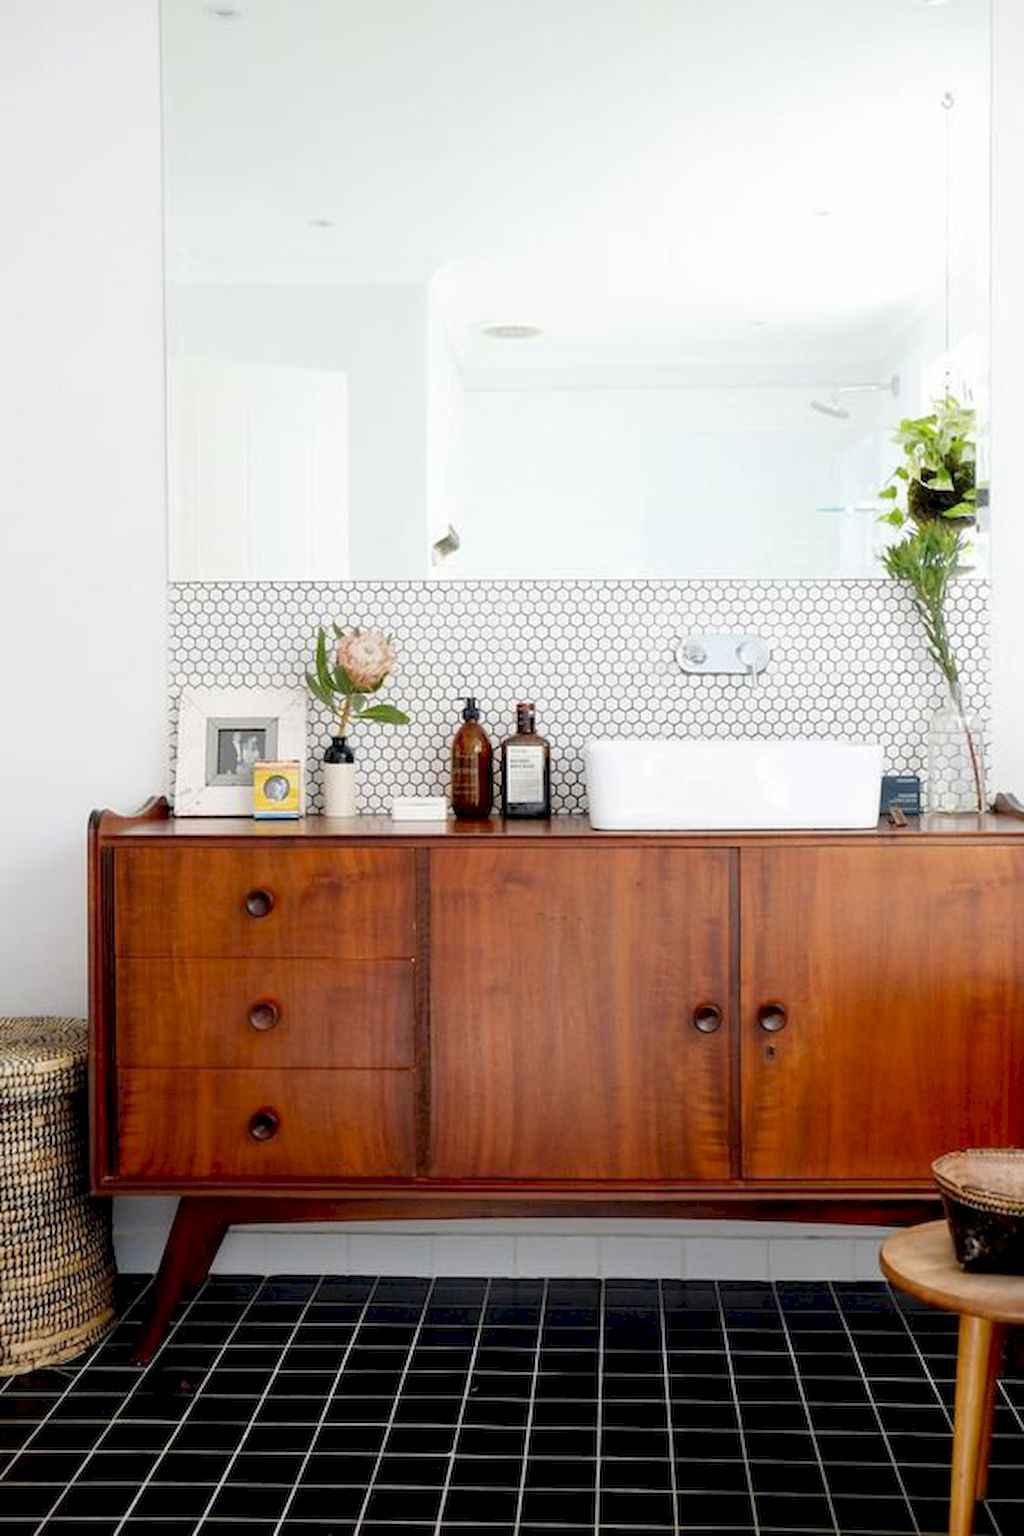 Mid century bathroom decoration ideas 8 homespecially for Mid century bathroom ideas